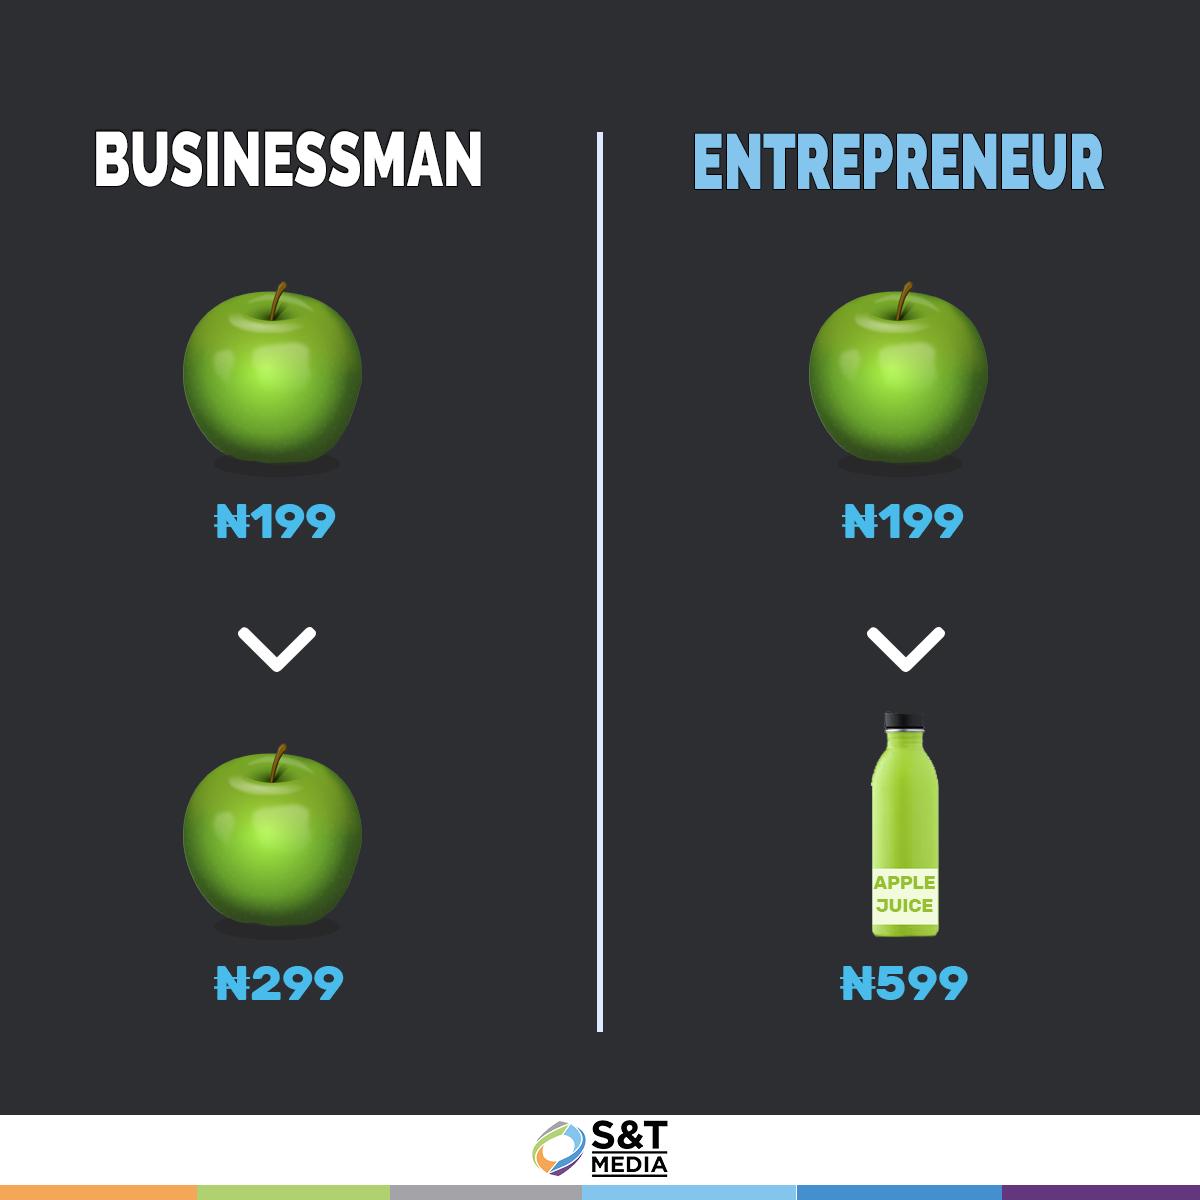 Which would you do and why? . Via @millionaire_mentor . #businesstip #tip #lagosbusinesshub #LagosBusiness #naijastartups #naijavirals #entrepreneur #businessman #smelagos #smallbusinesses #millionairementor #sandtmediapic.twitter.com/g7jzUbSCeQ